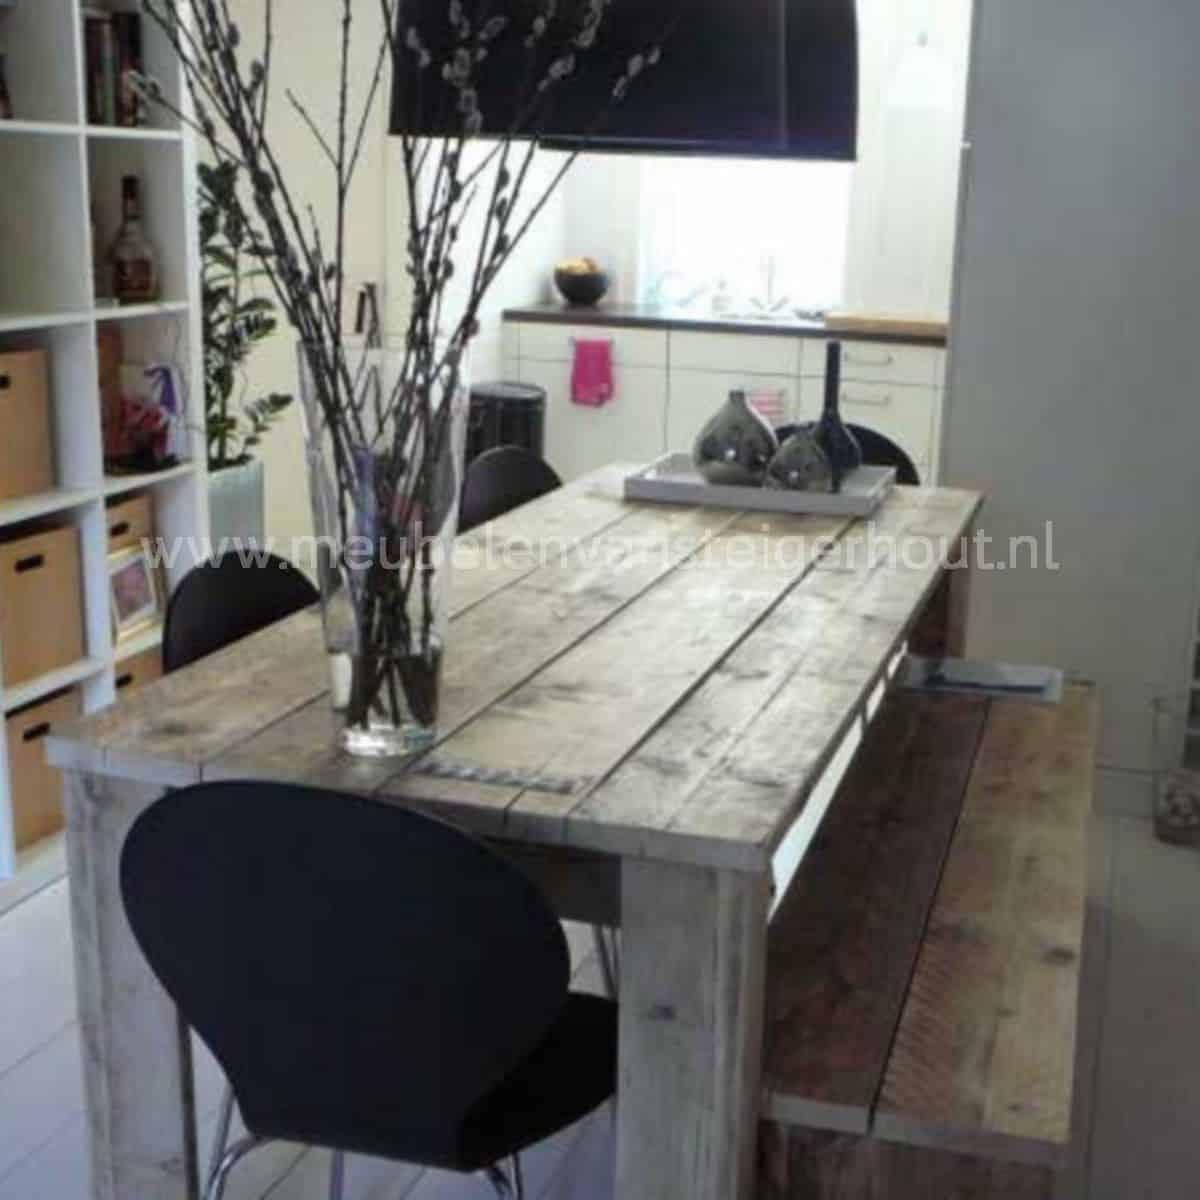 Eettafel standaard model meubelen van steigerhout for Steigerhouten eettafel maken